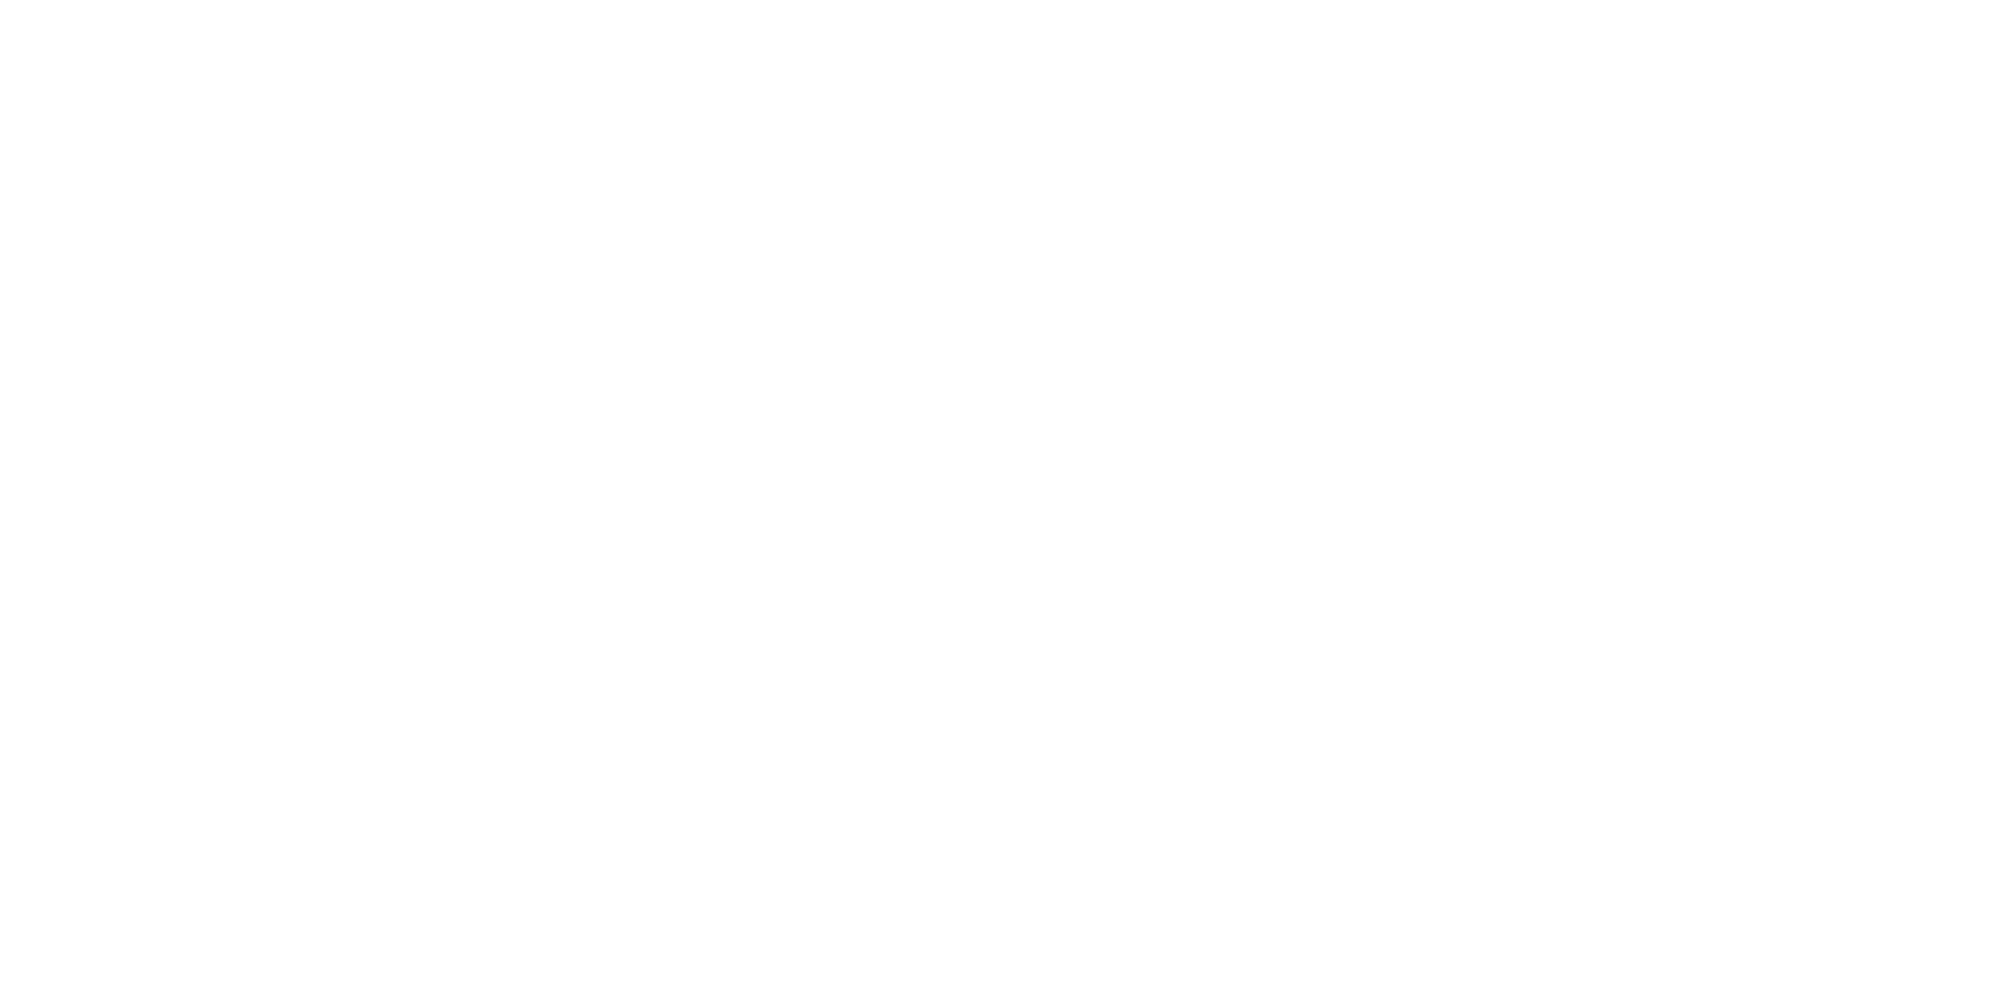 Solidarietà Insieme 2010